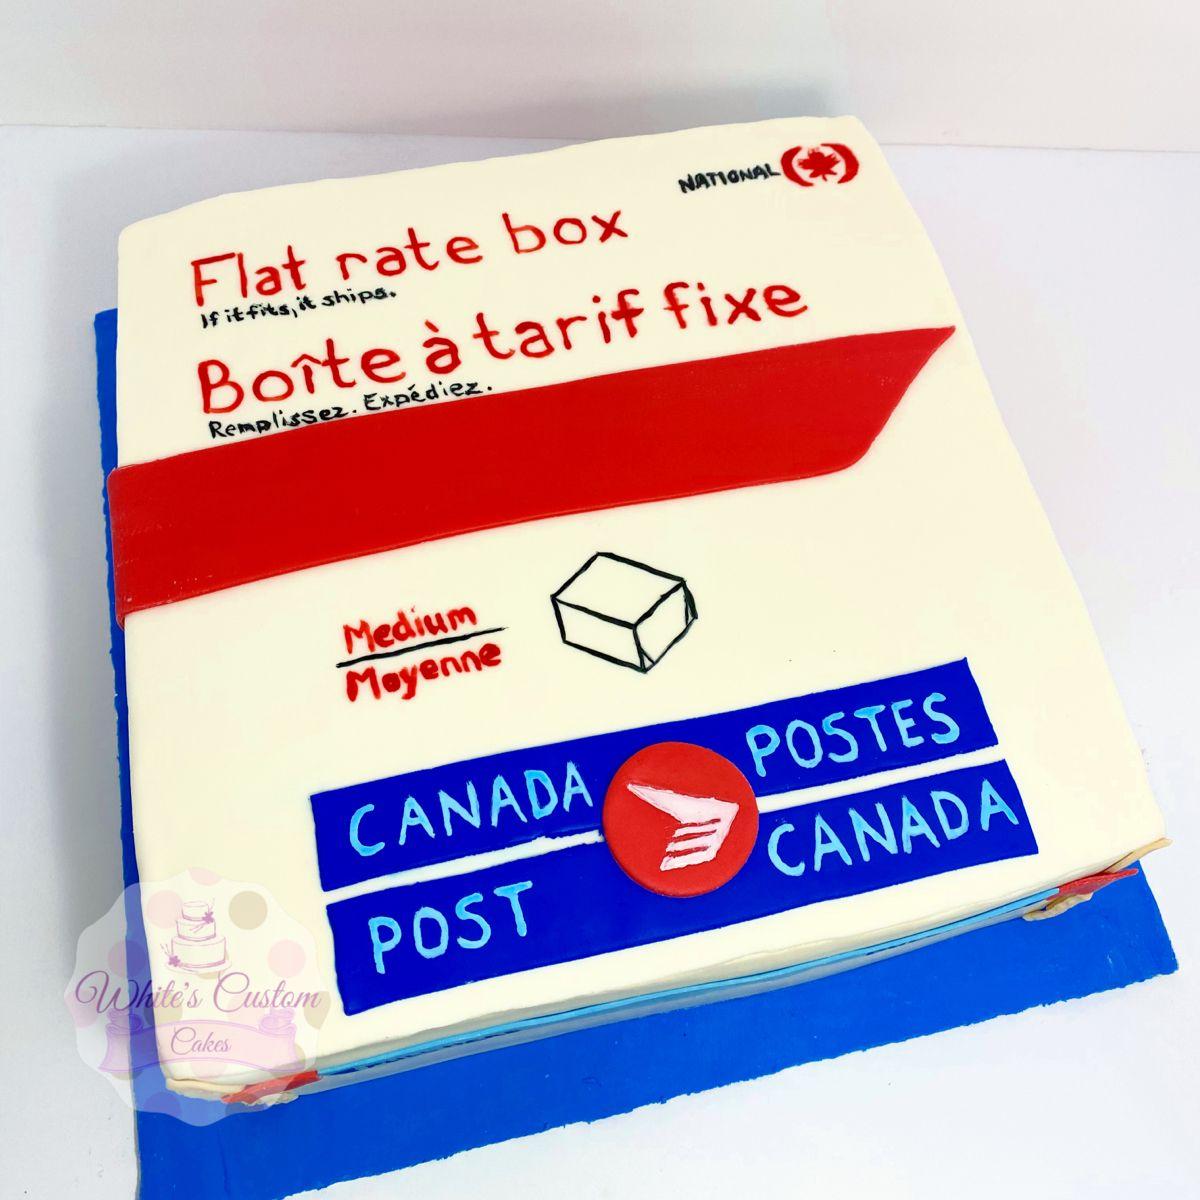 Canada post cake in 2020 custom cakes checkered cake cake